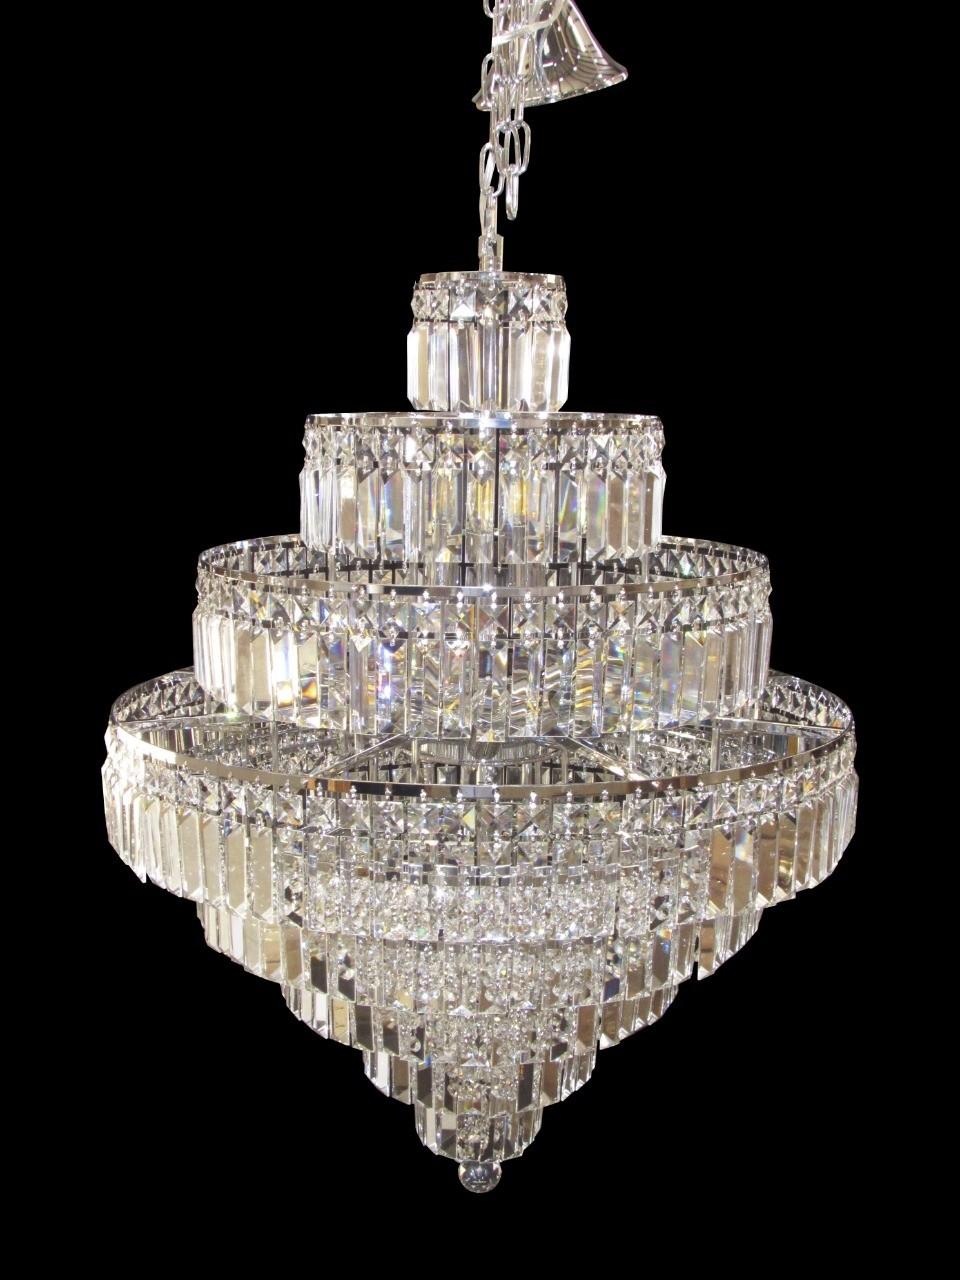 Lustre Imperial de Cristal Transparente e Estrutura Cromada 18 Lâmpadas - Frontier